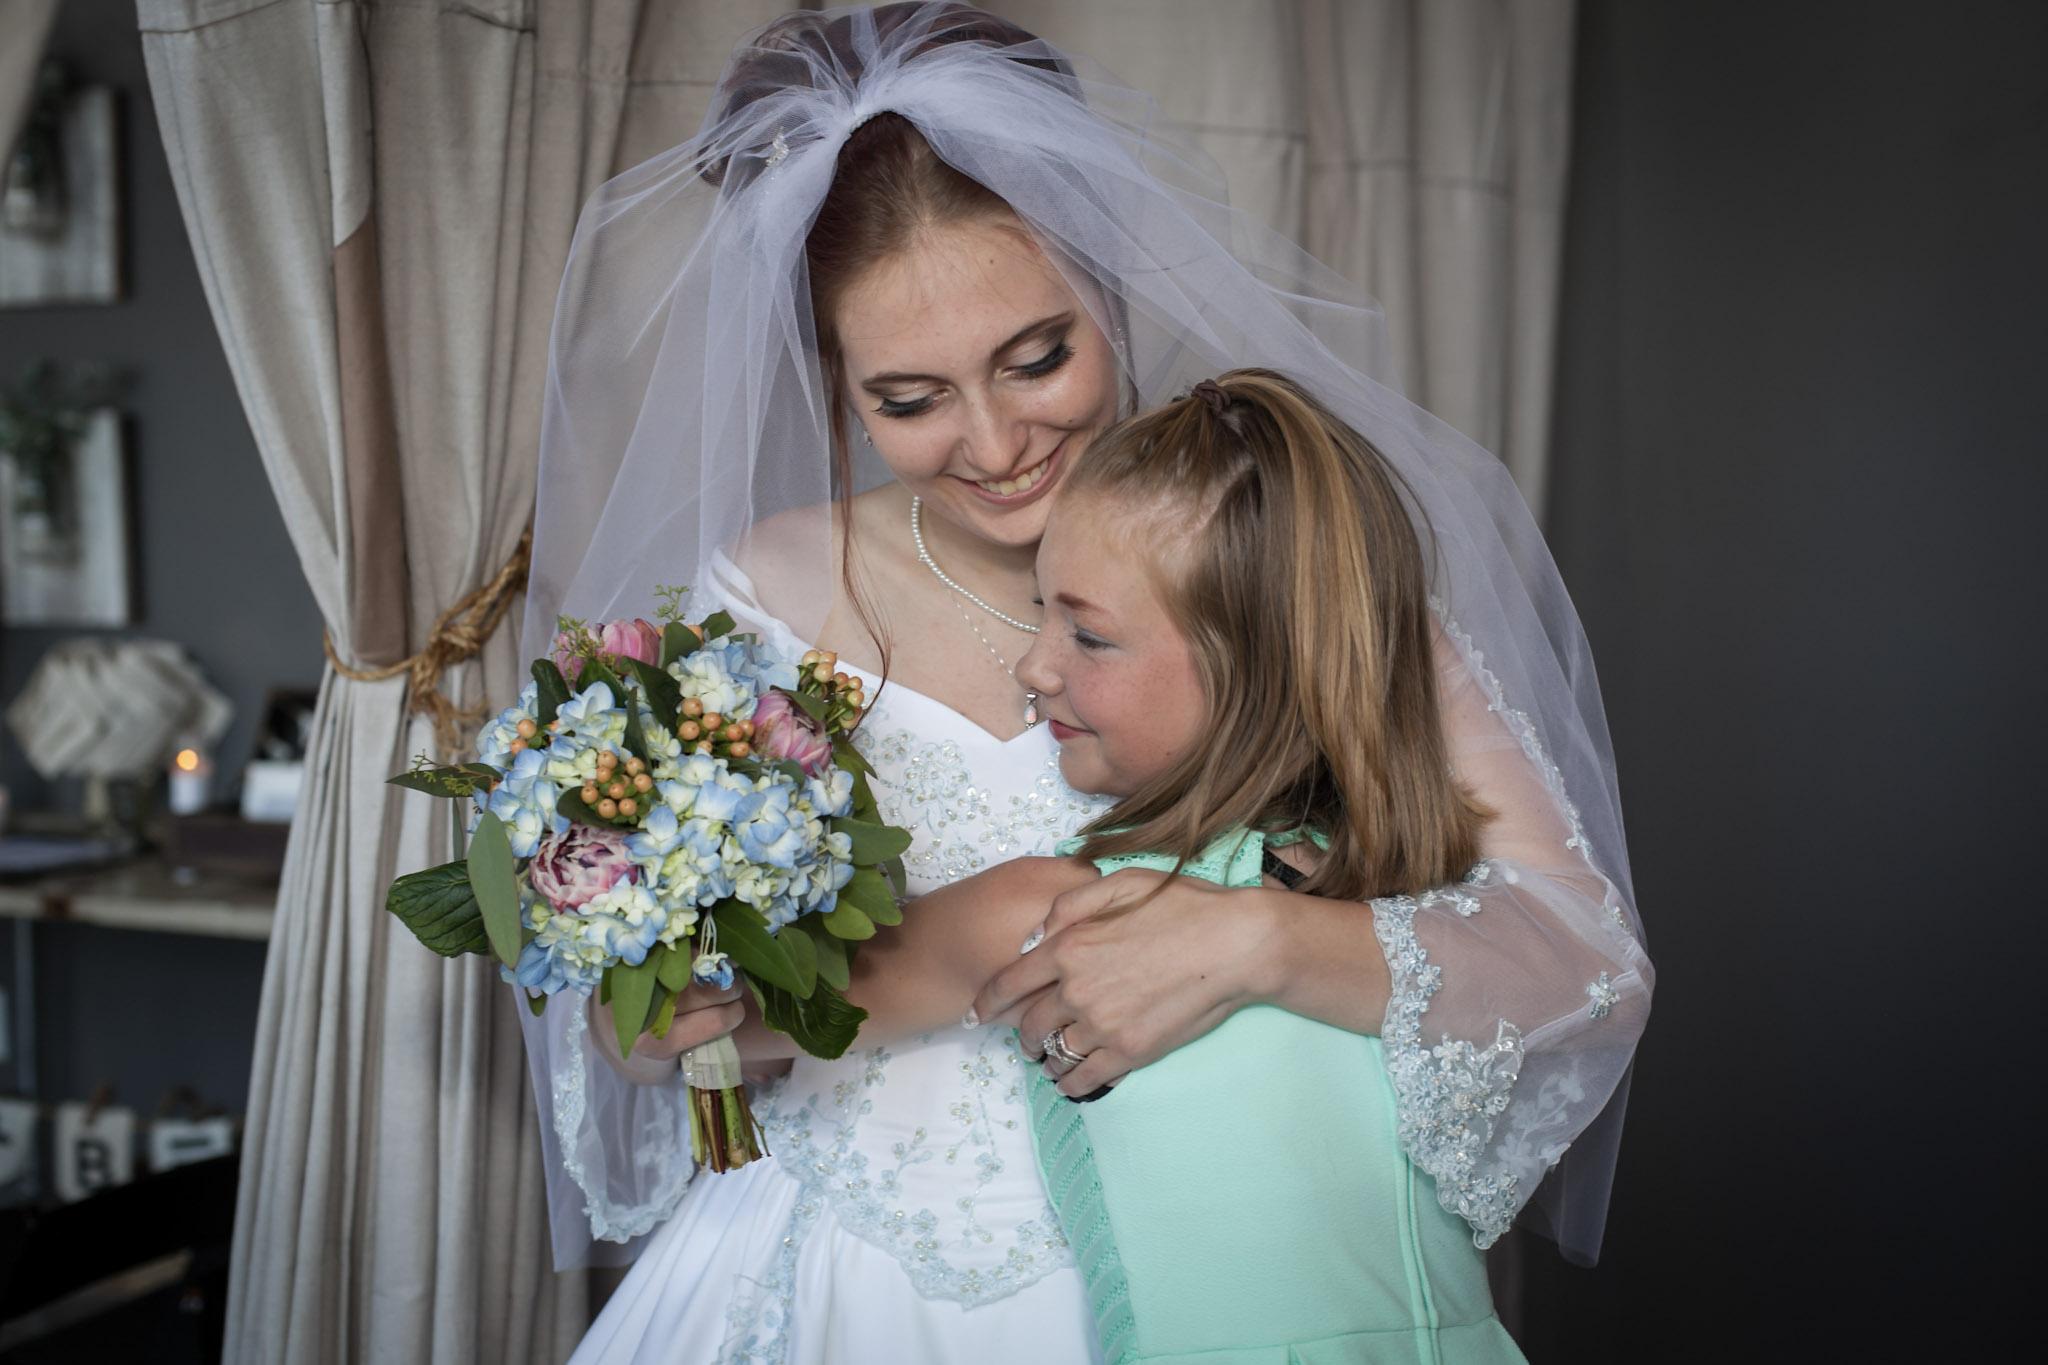 Kansas+City-Small+Wedding-Elope_Intimate_Ceremony_Mother's+Day7.jpg